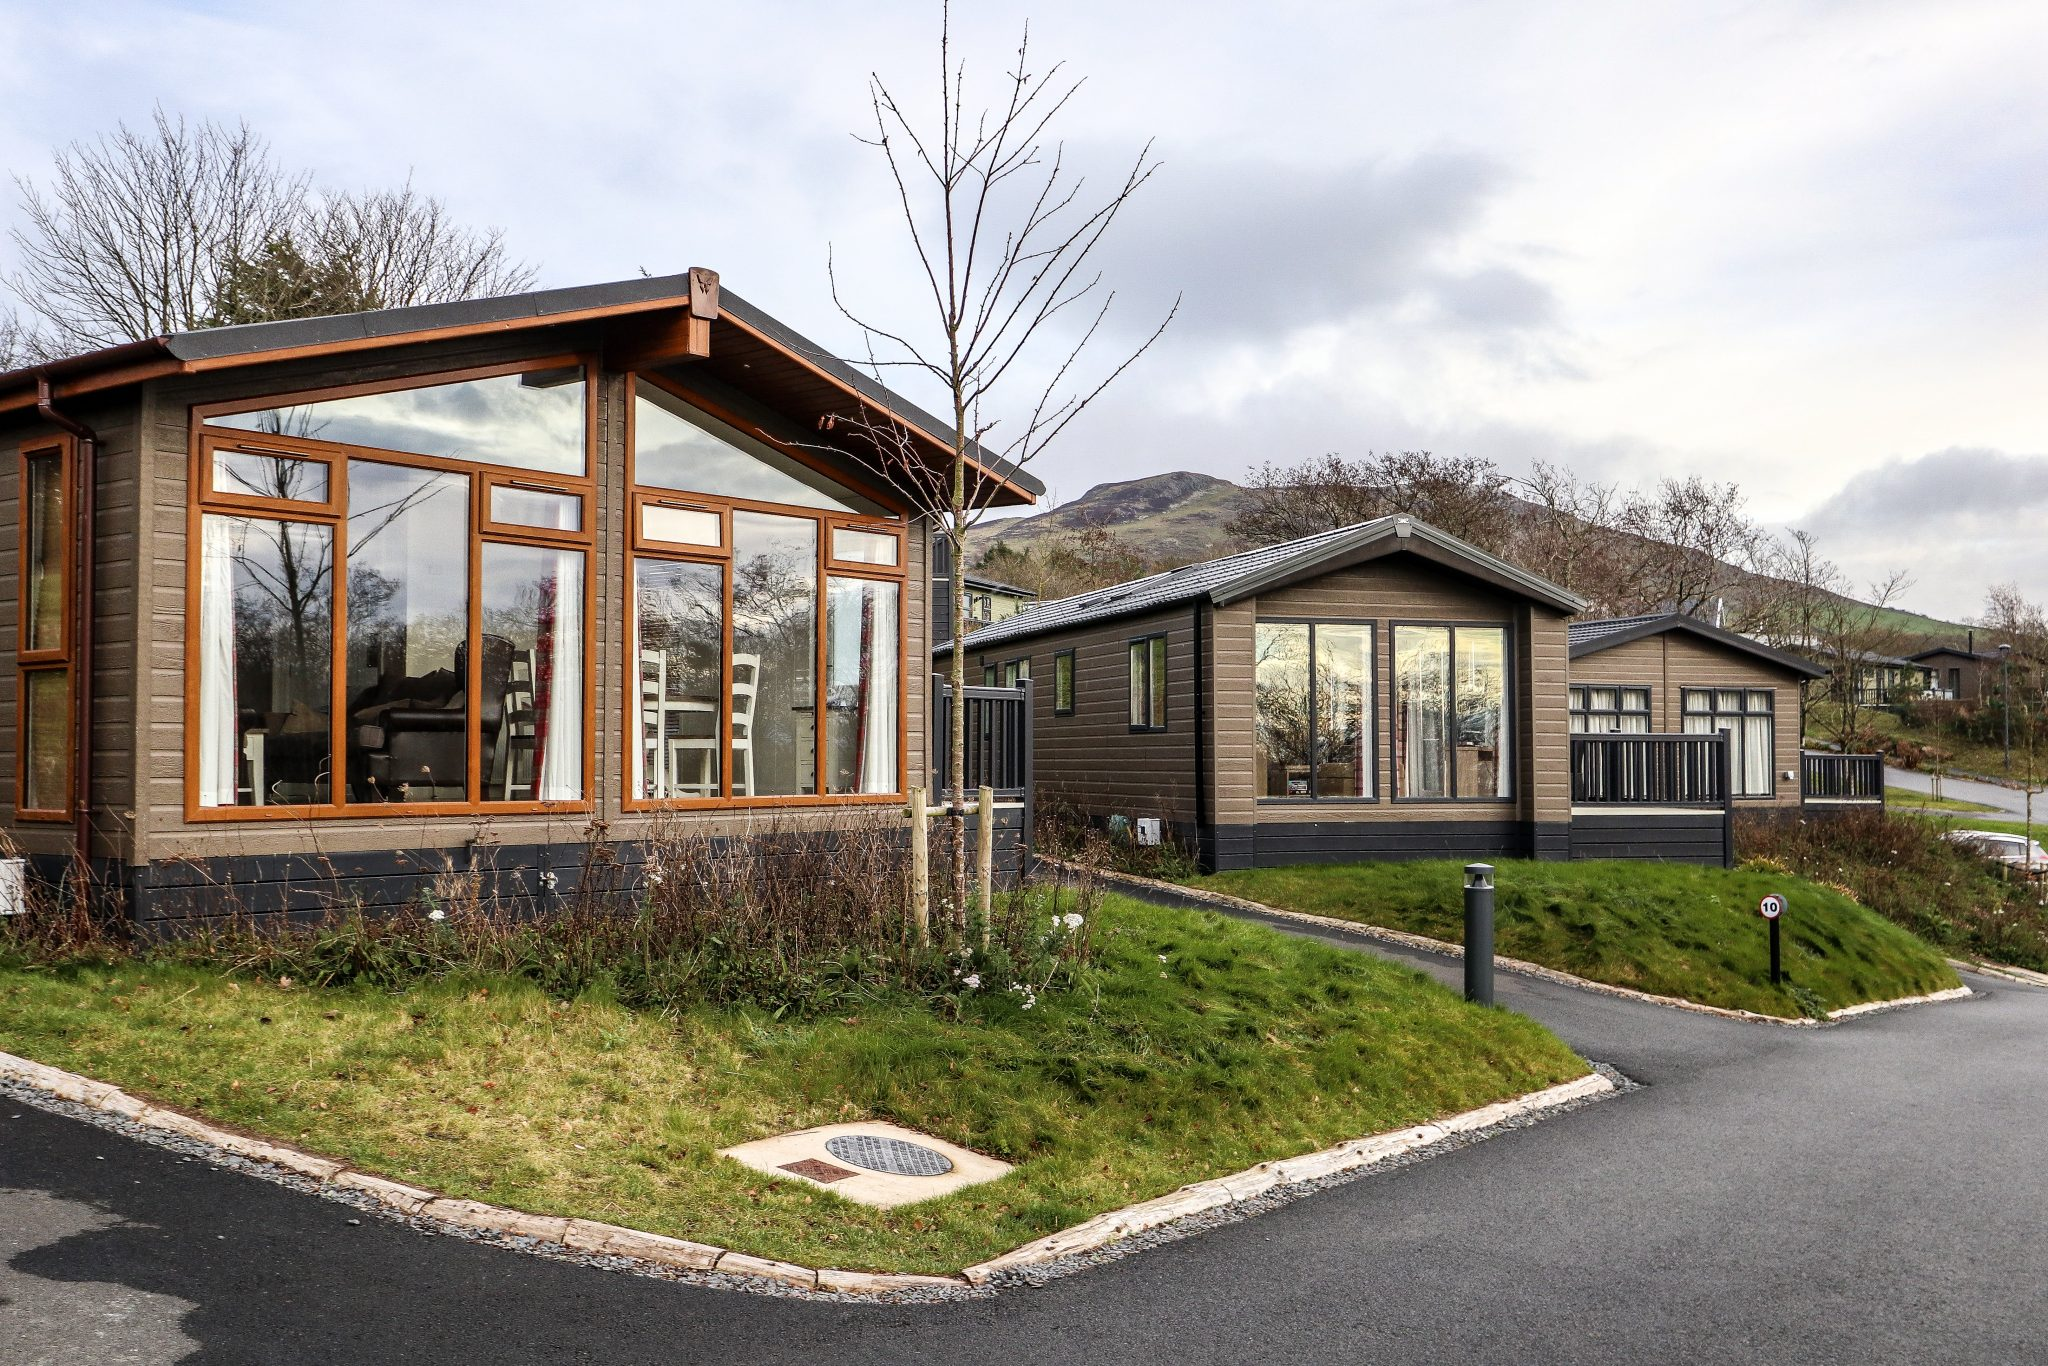 Lodges at Keswick Reach Lodge Retreat, The Lake District